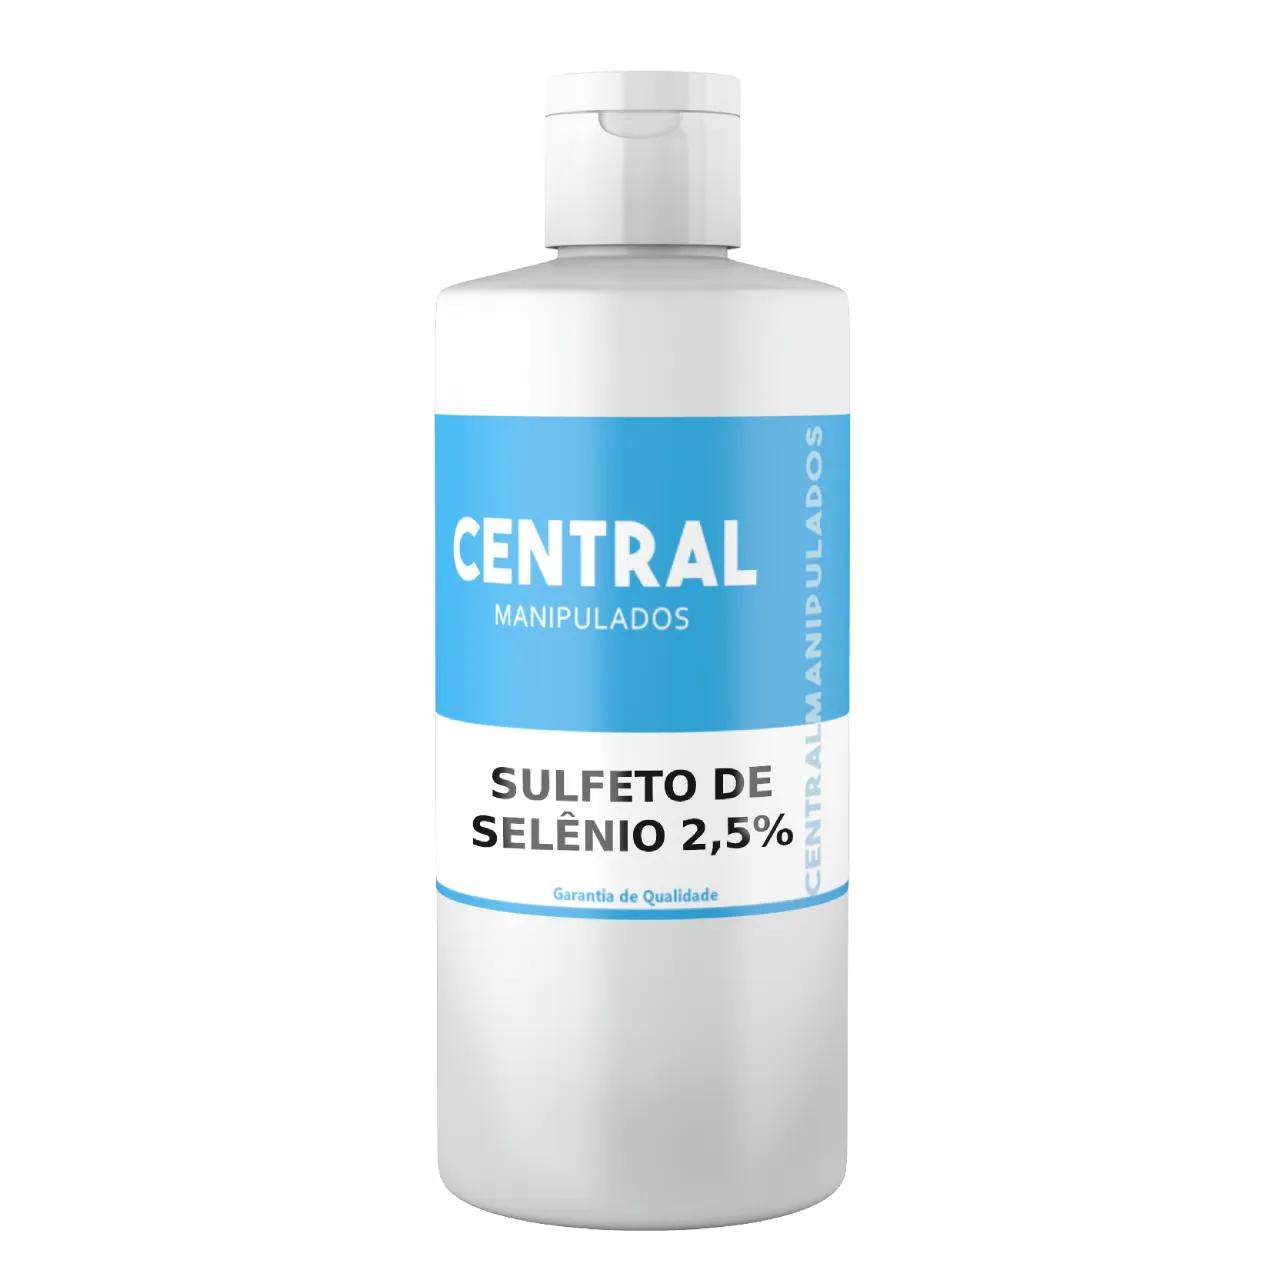 Shampoo Sulfeto de Selênio 2,5% - 100ml - Anticaspa, Anti-séptica, Antifúngica, Anti-Seborréica